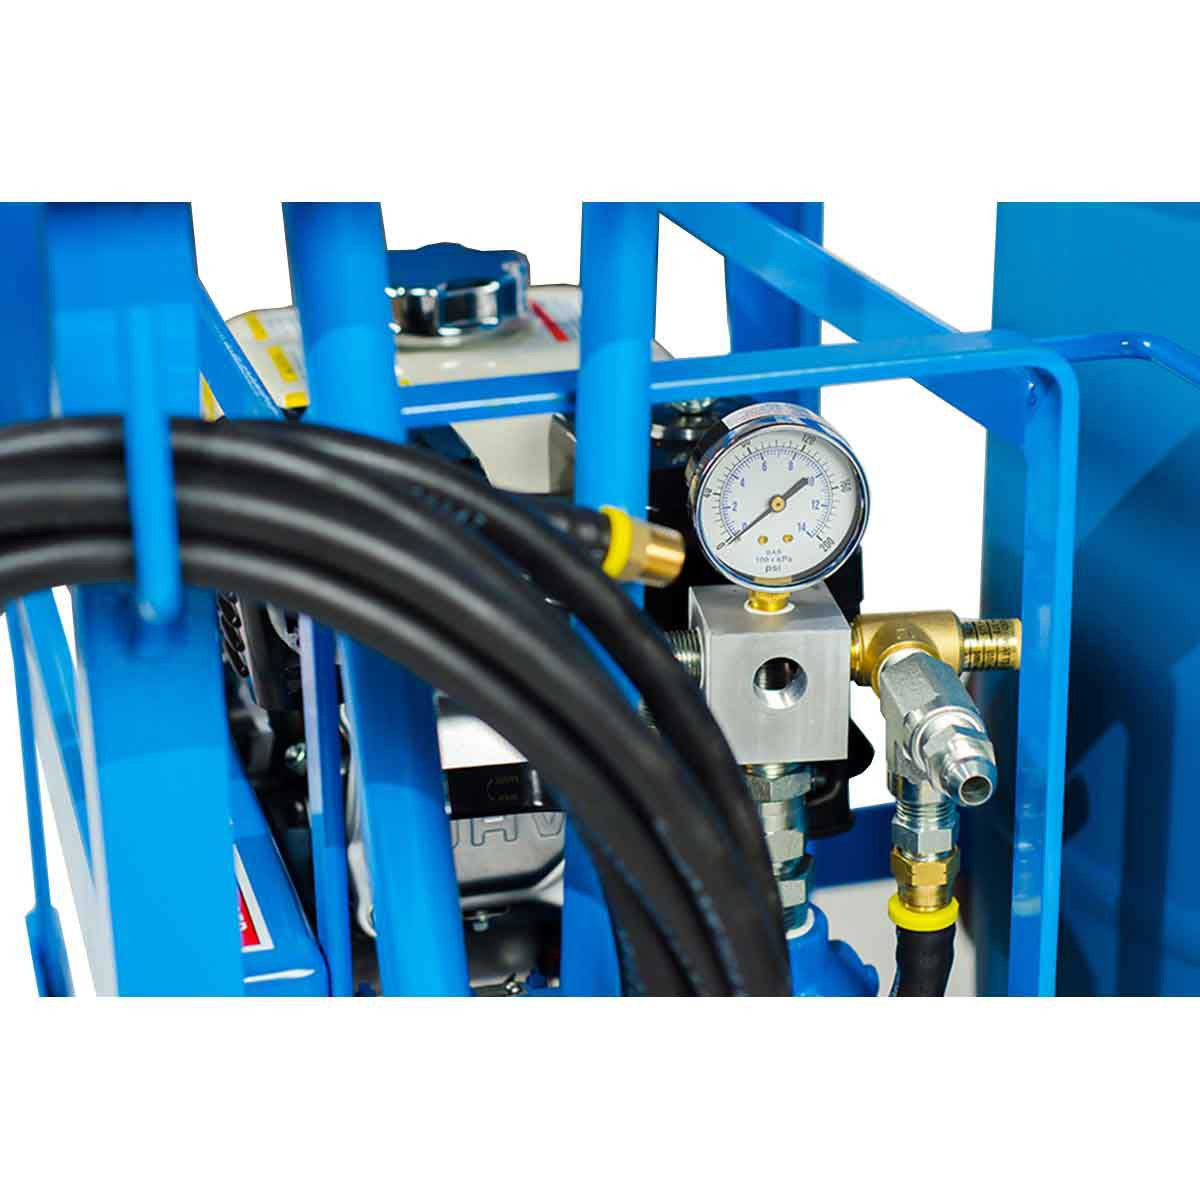 S201 Bartell Power Sprayer gauges